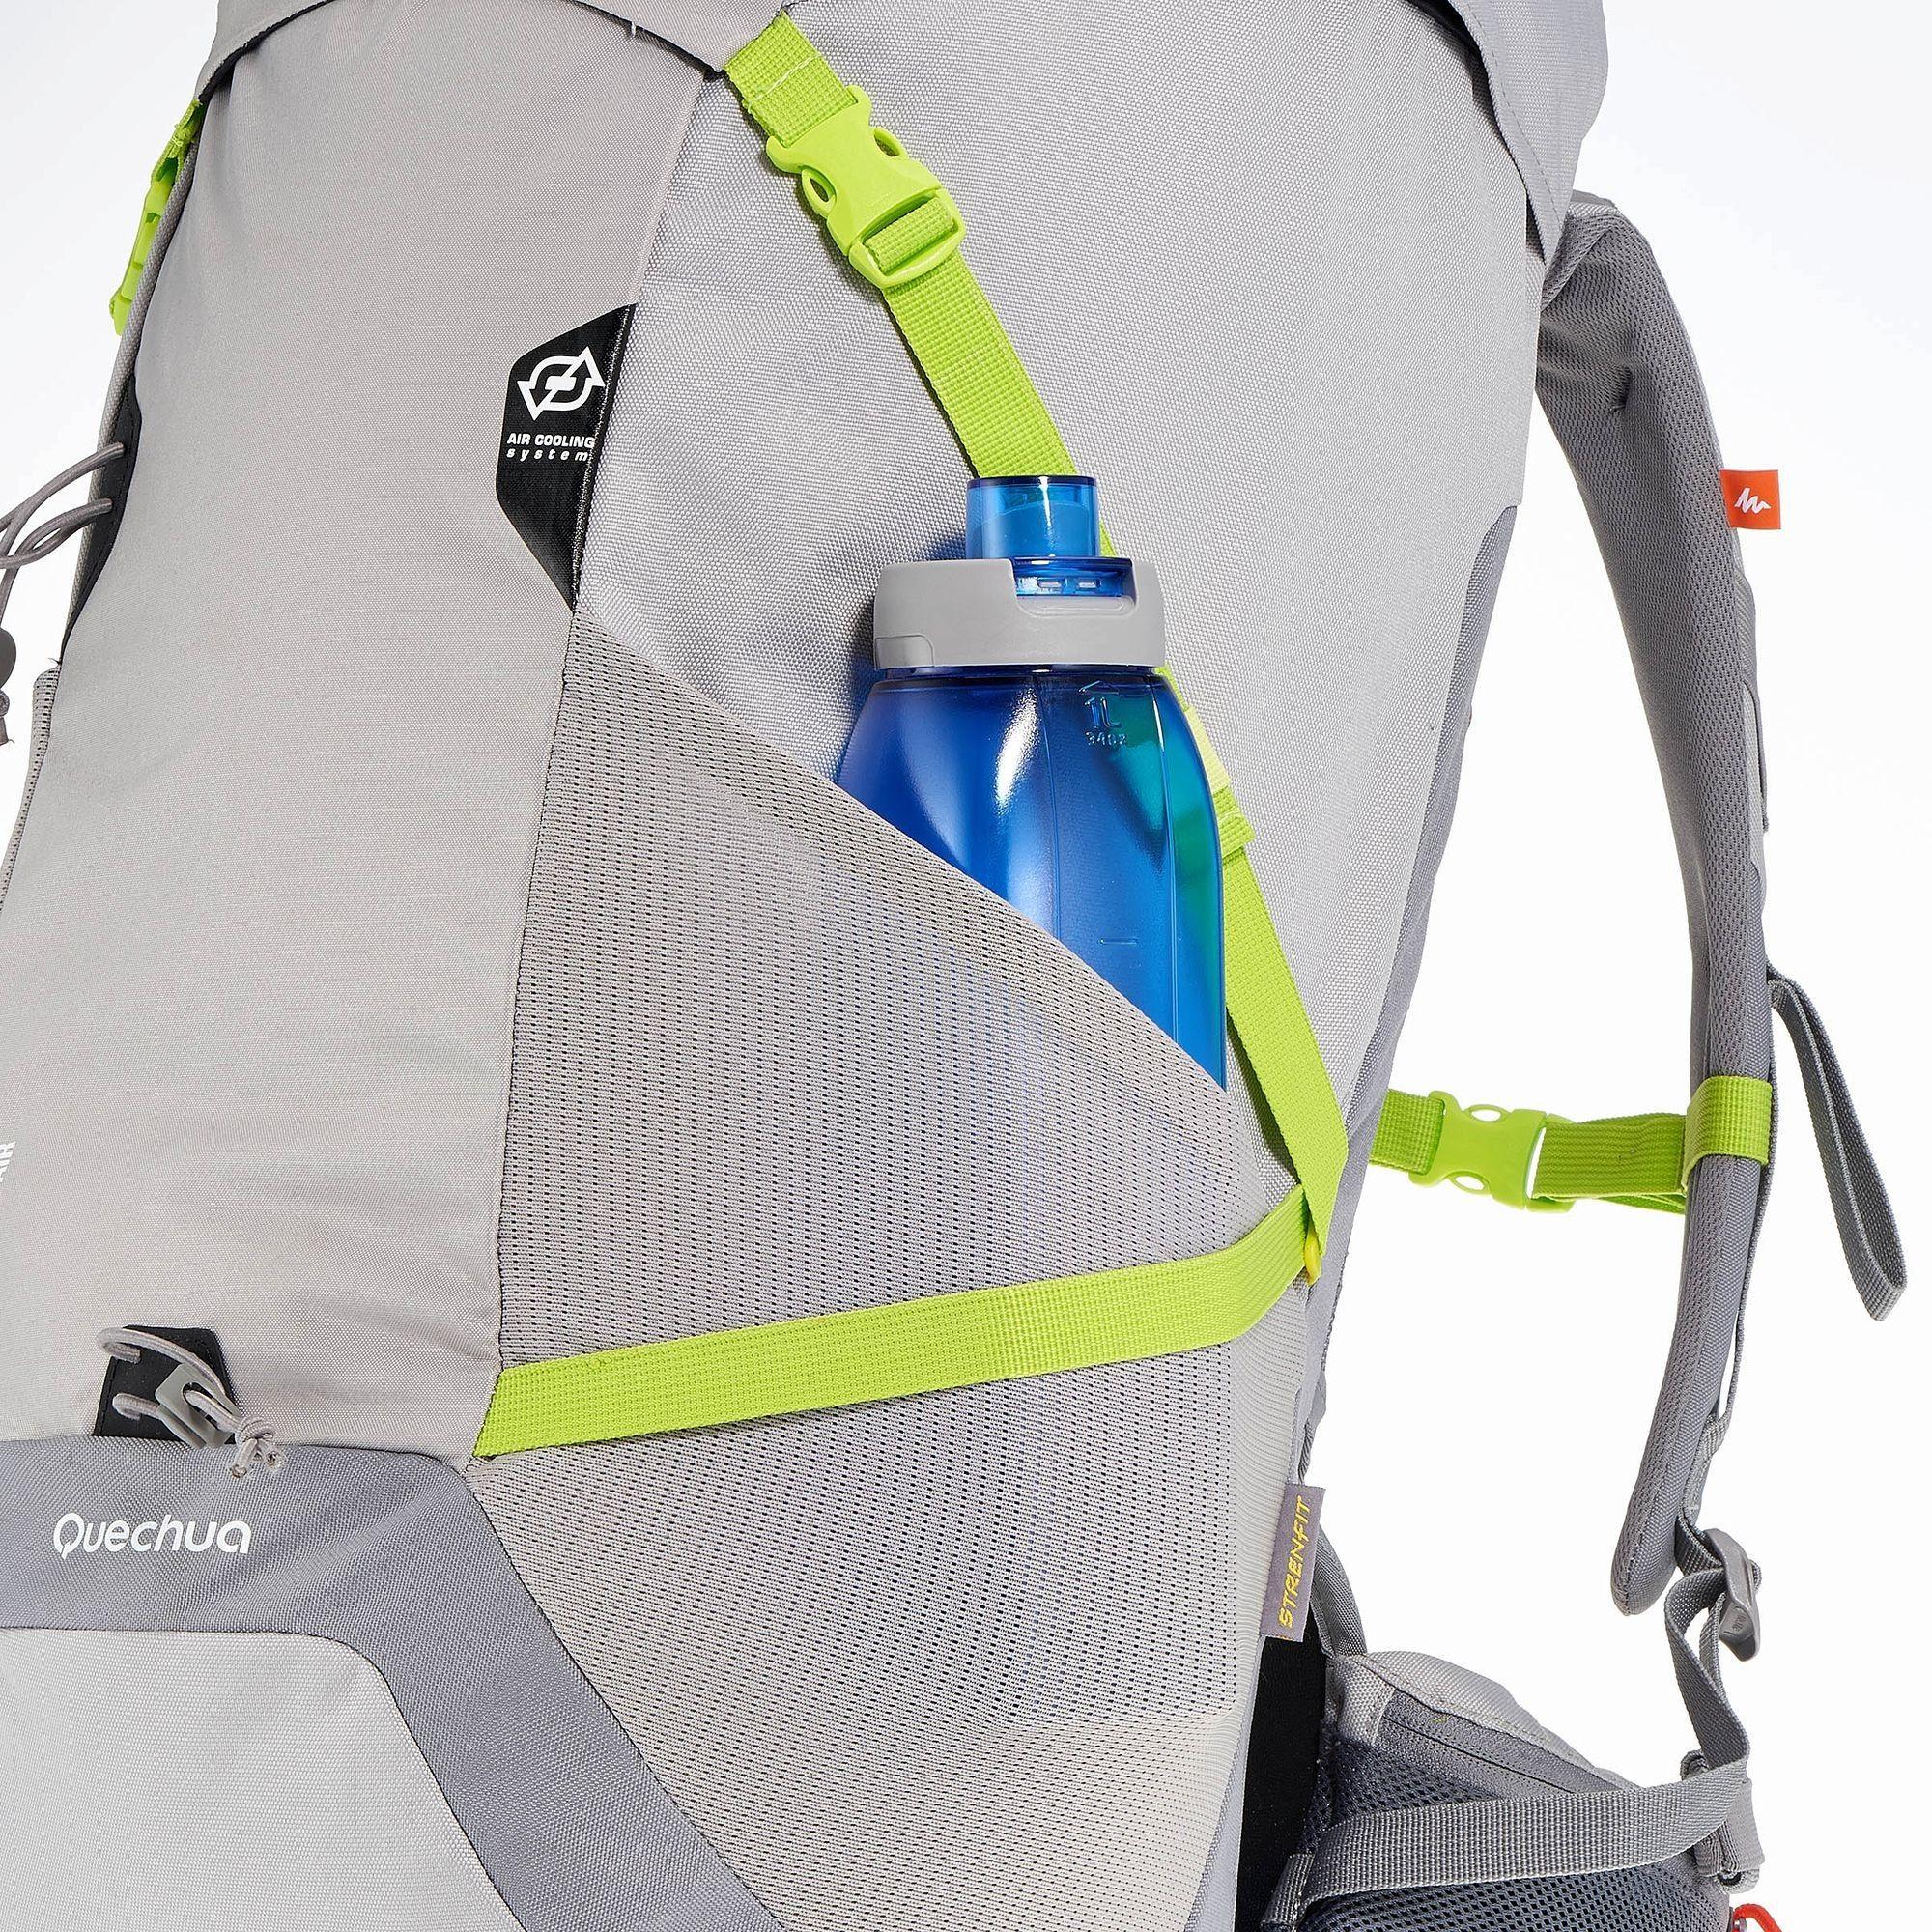 sac a dos f 40 air gris vert quechua sacs dos randonn e decathlon backpack pinterest. Black Bedroom Furniture Sets. Home Design Ideas